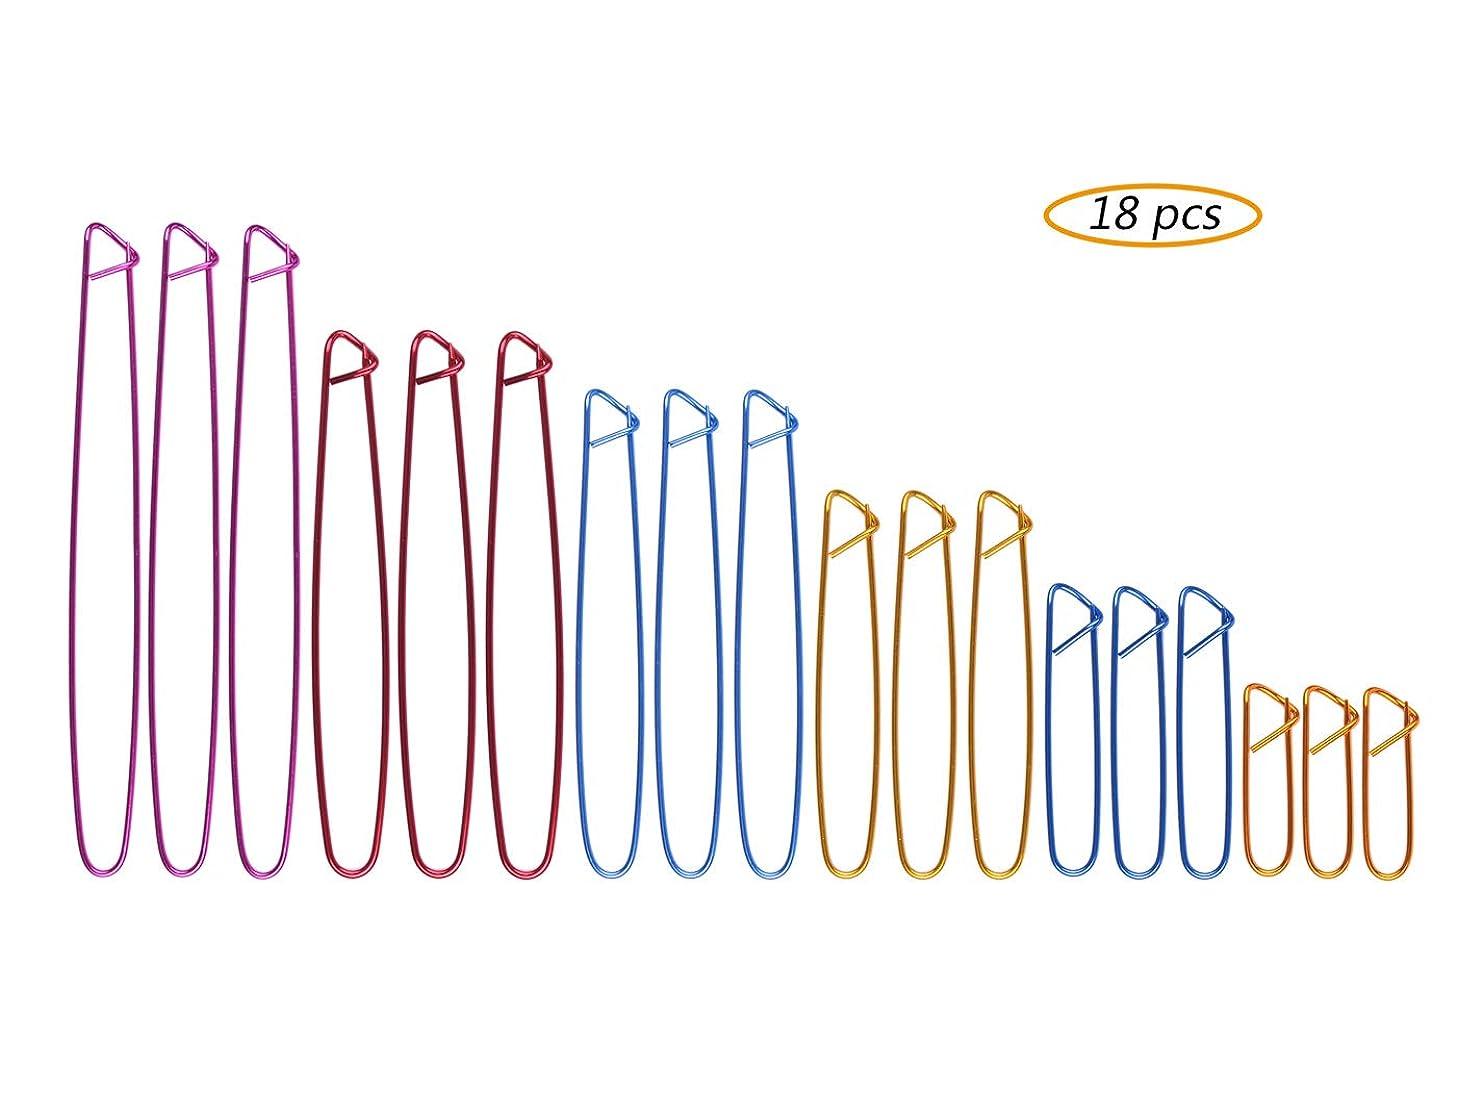 18 PCS Knitting Stitch Holders - Yarn Stitch Holder Set for Knitting Notions/Crochet Needle Aluminum Stitch Holders Safety Pins, 6 Sizes, Assorted Colors